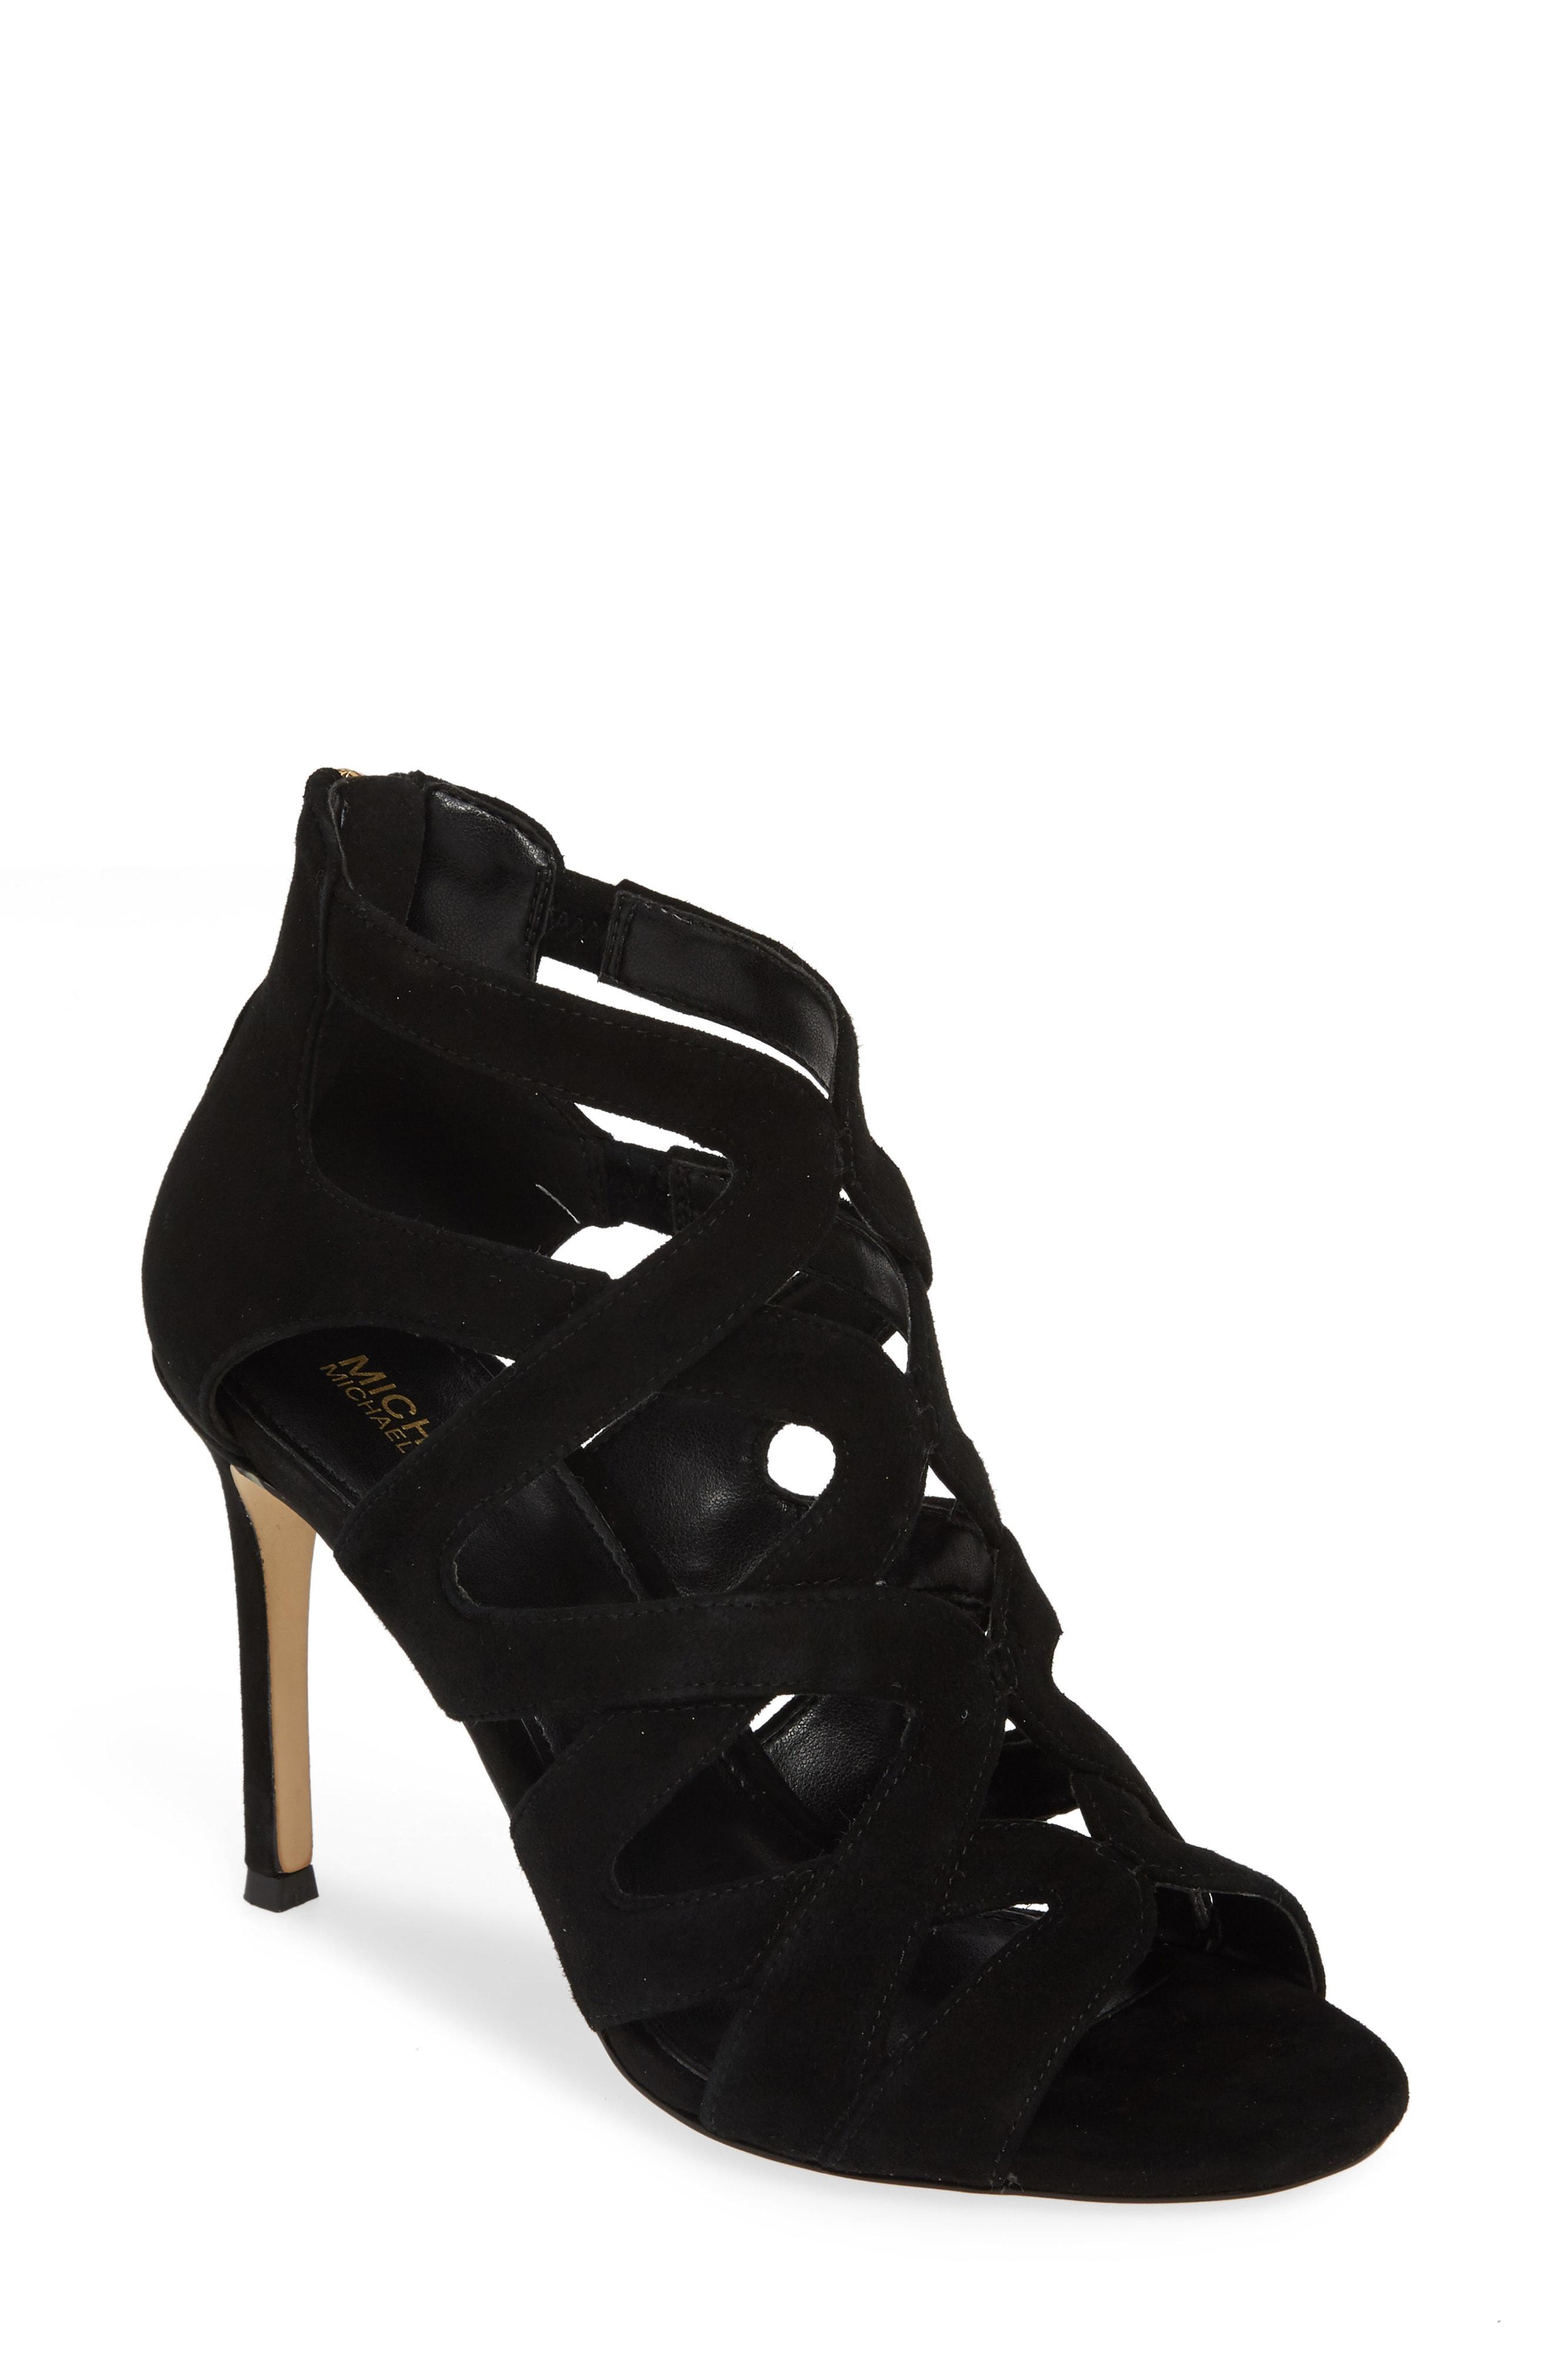 7c35df1812b Lyst - MICHAEL Michael Kors Annalee Sandal in Black